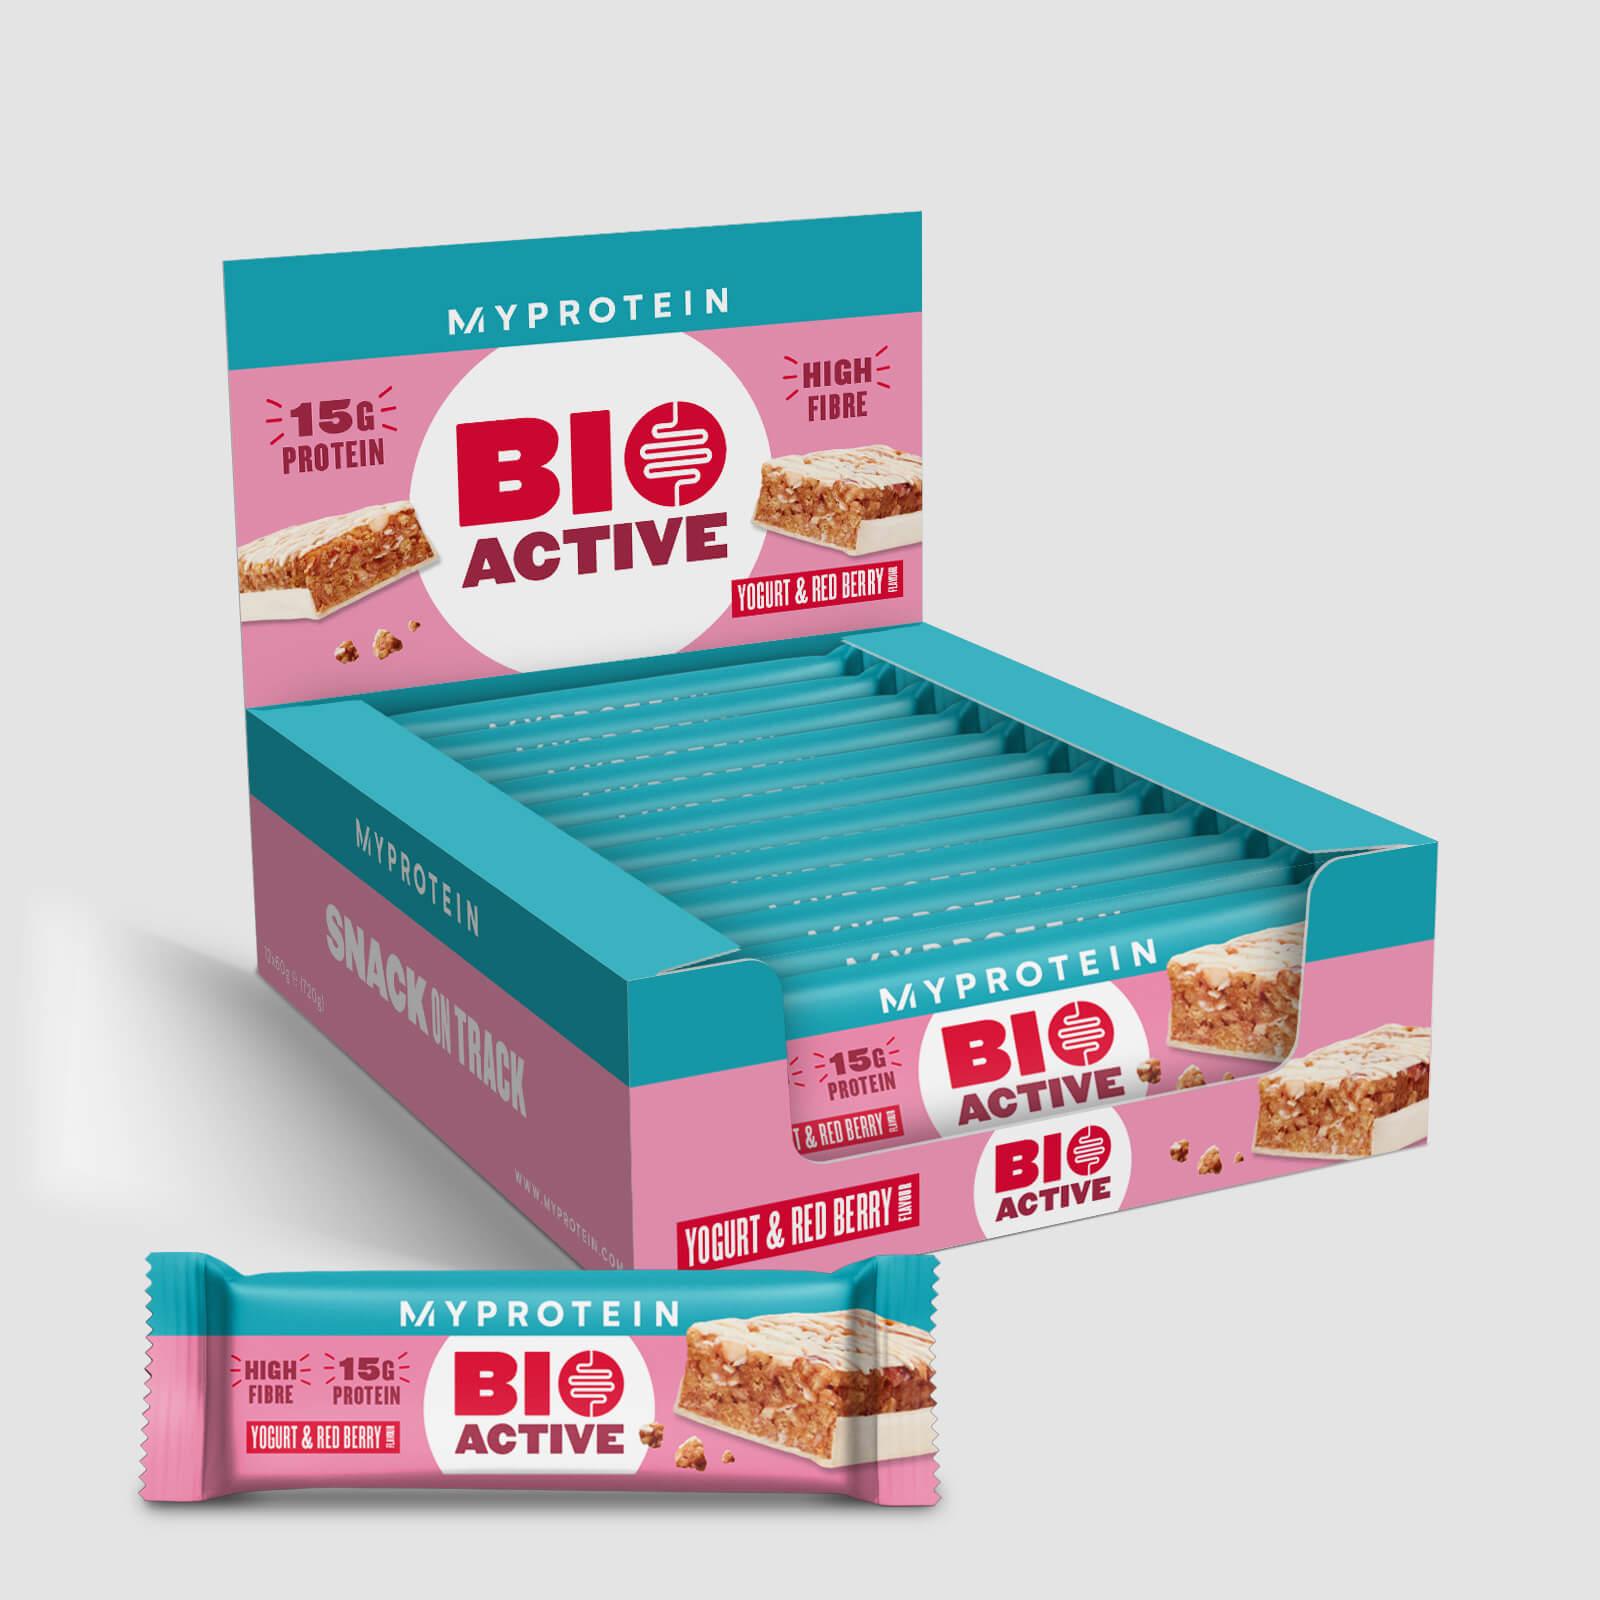 Батончик Bioactive - 12 x 60g - Yoghurt & Red Fruit